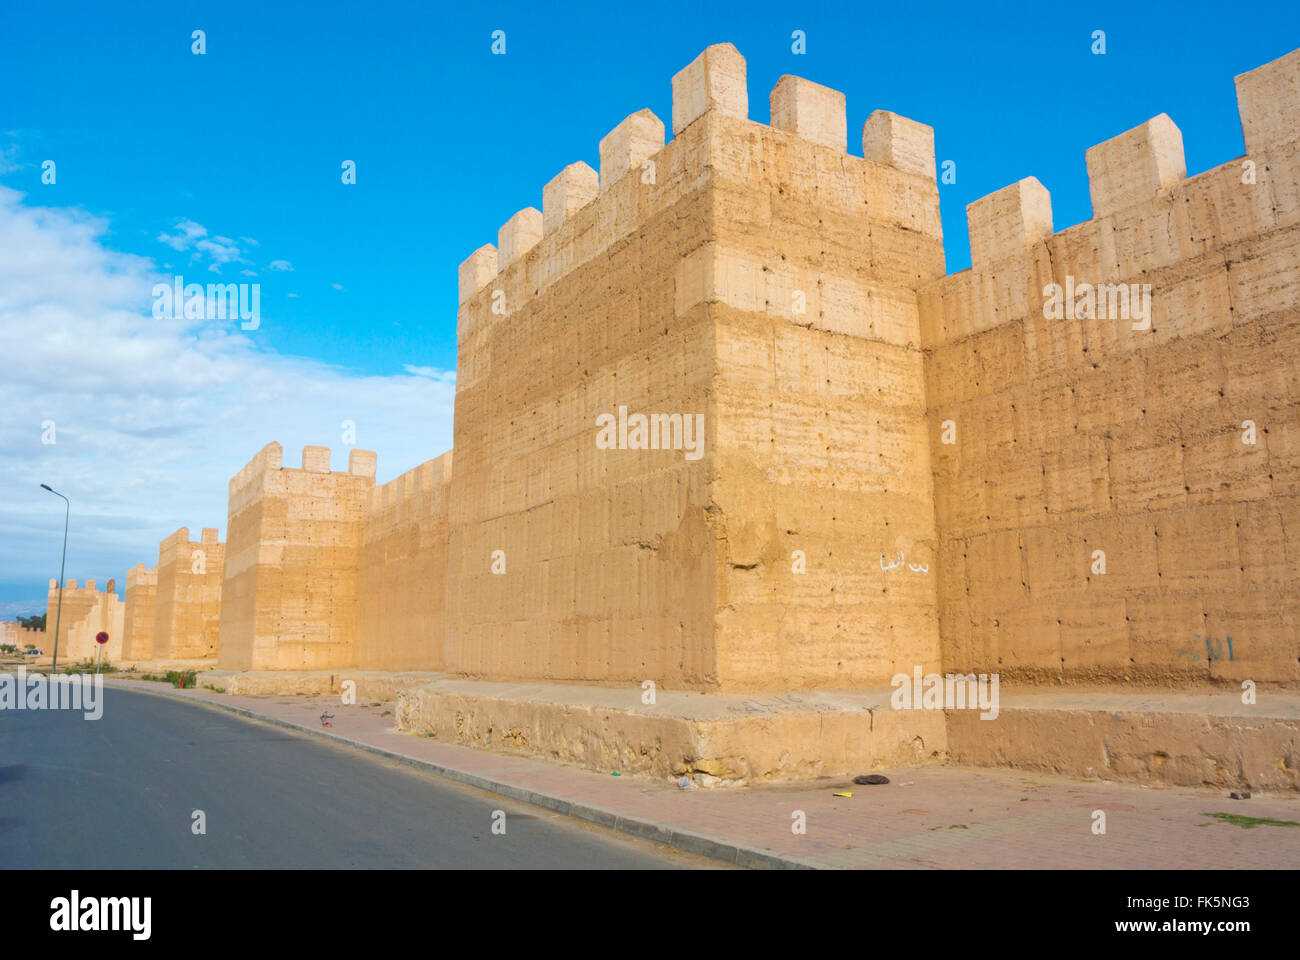 City walls, Rocade Taroudant, Taroudant, Souss valley, southern Morocco, northern Africa - Stock Image